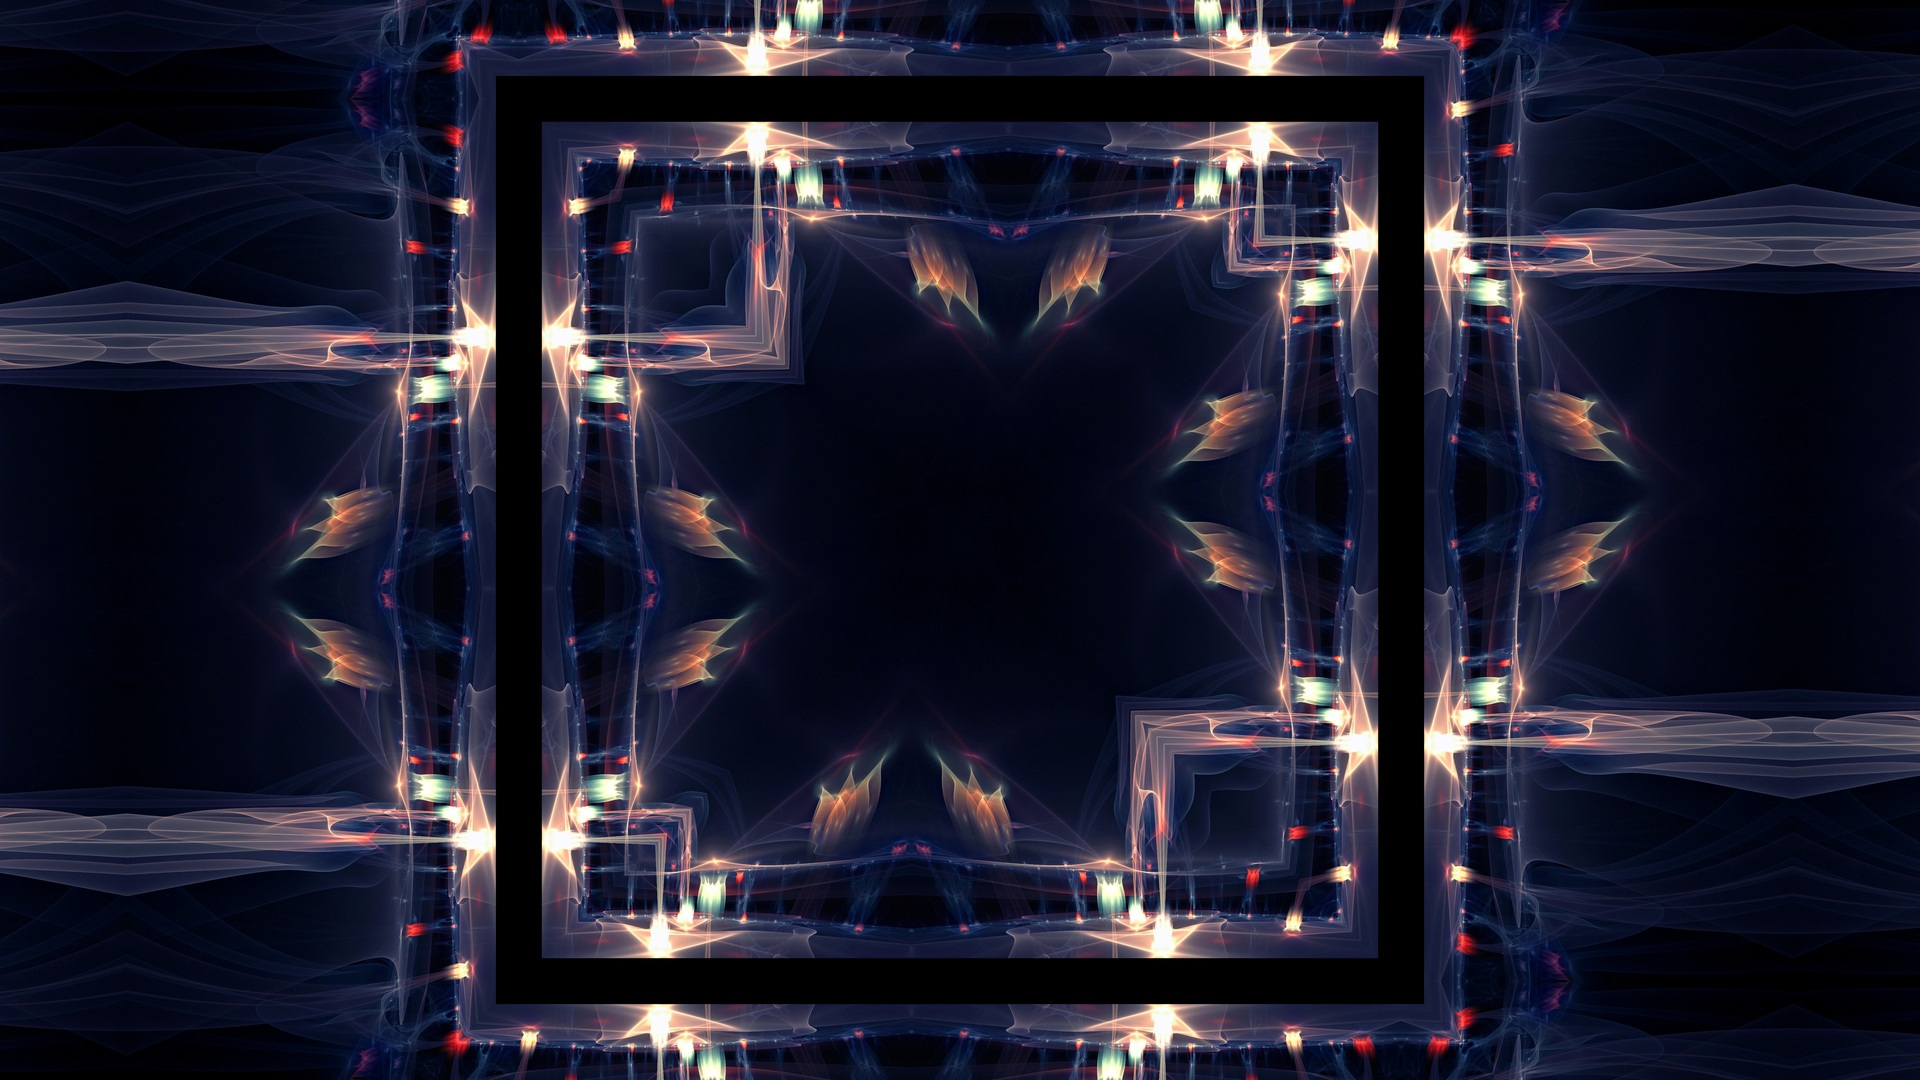 1920x1080 cosmos pattern illustration laptop full hd 1080p hd 4k